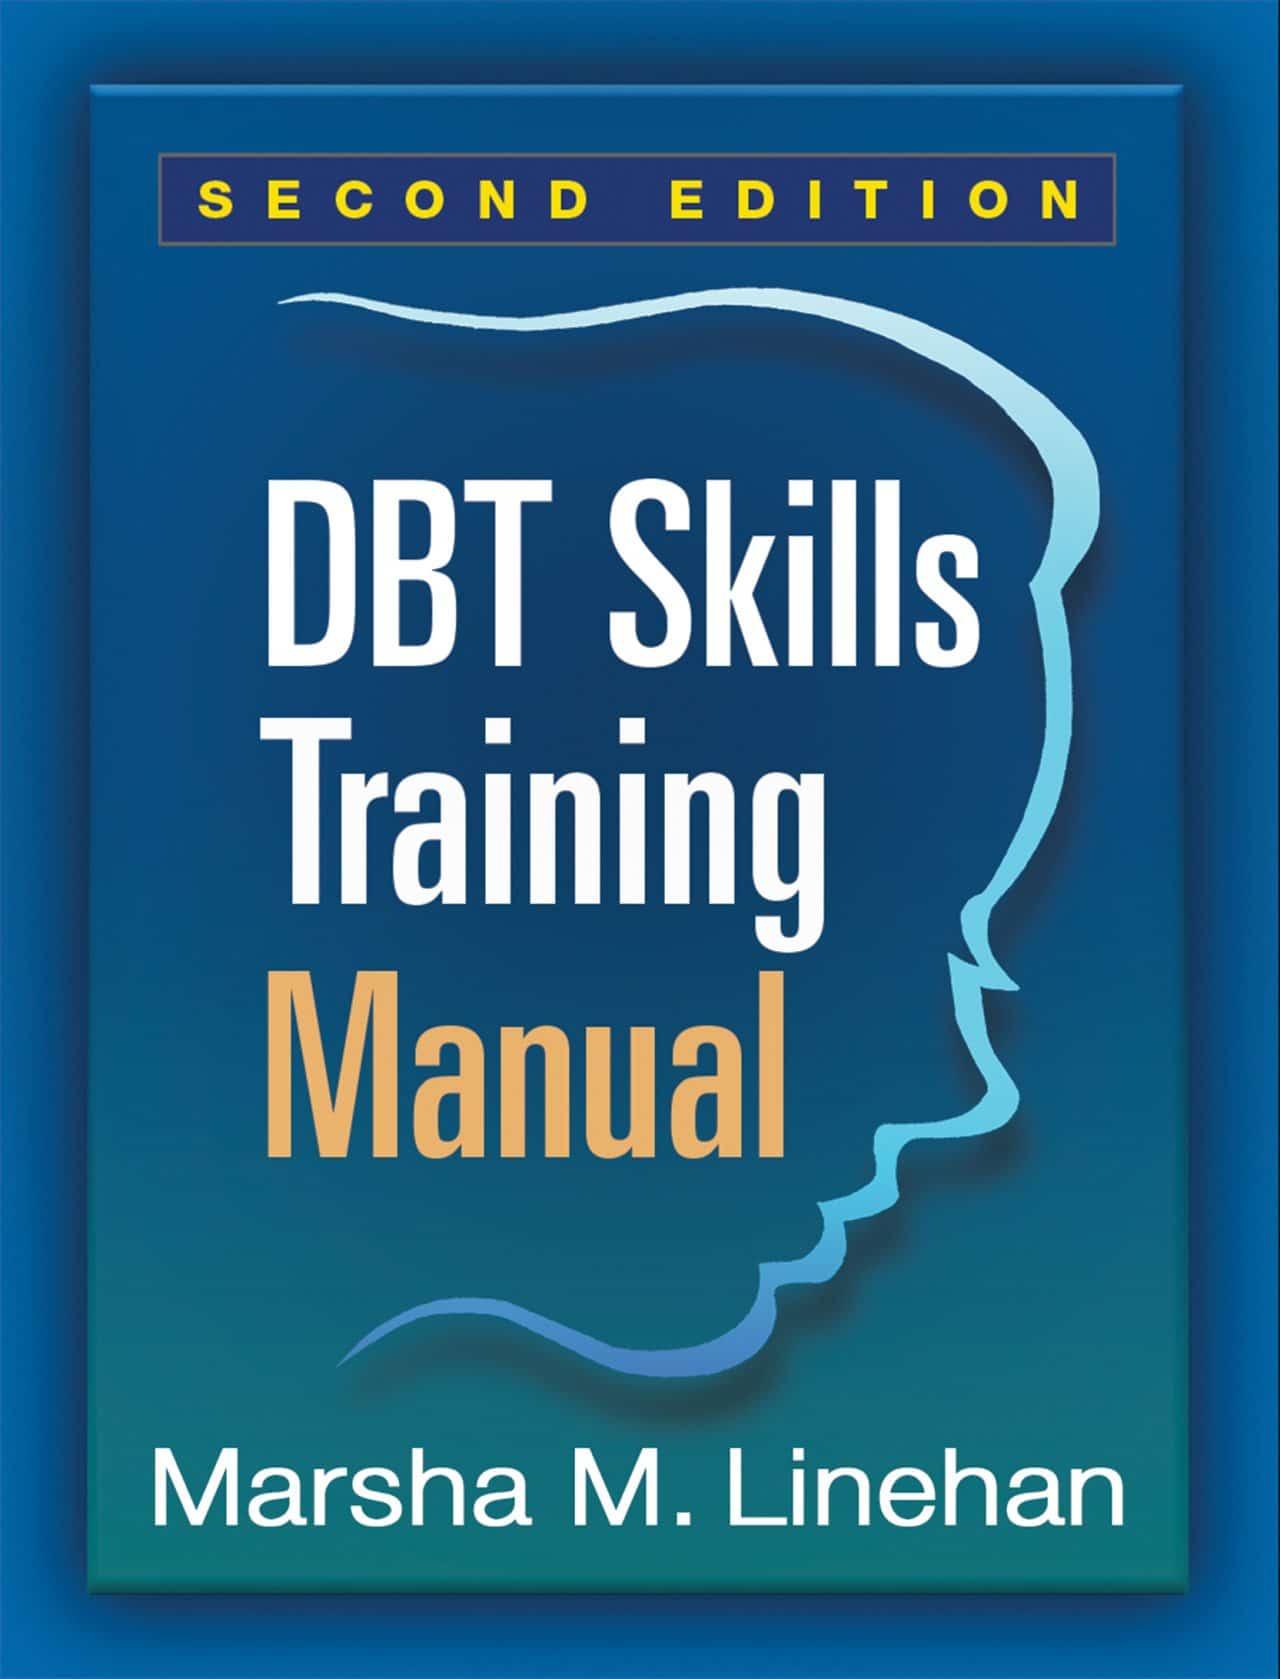 DBT Skills Training Manuale